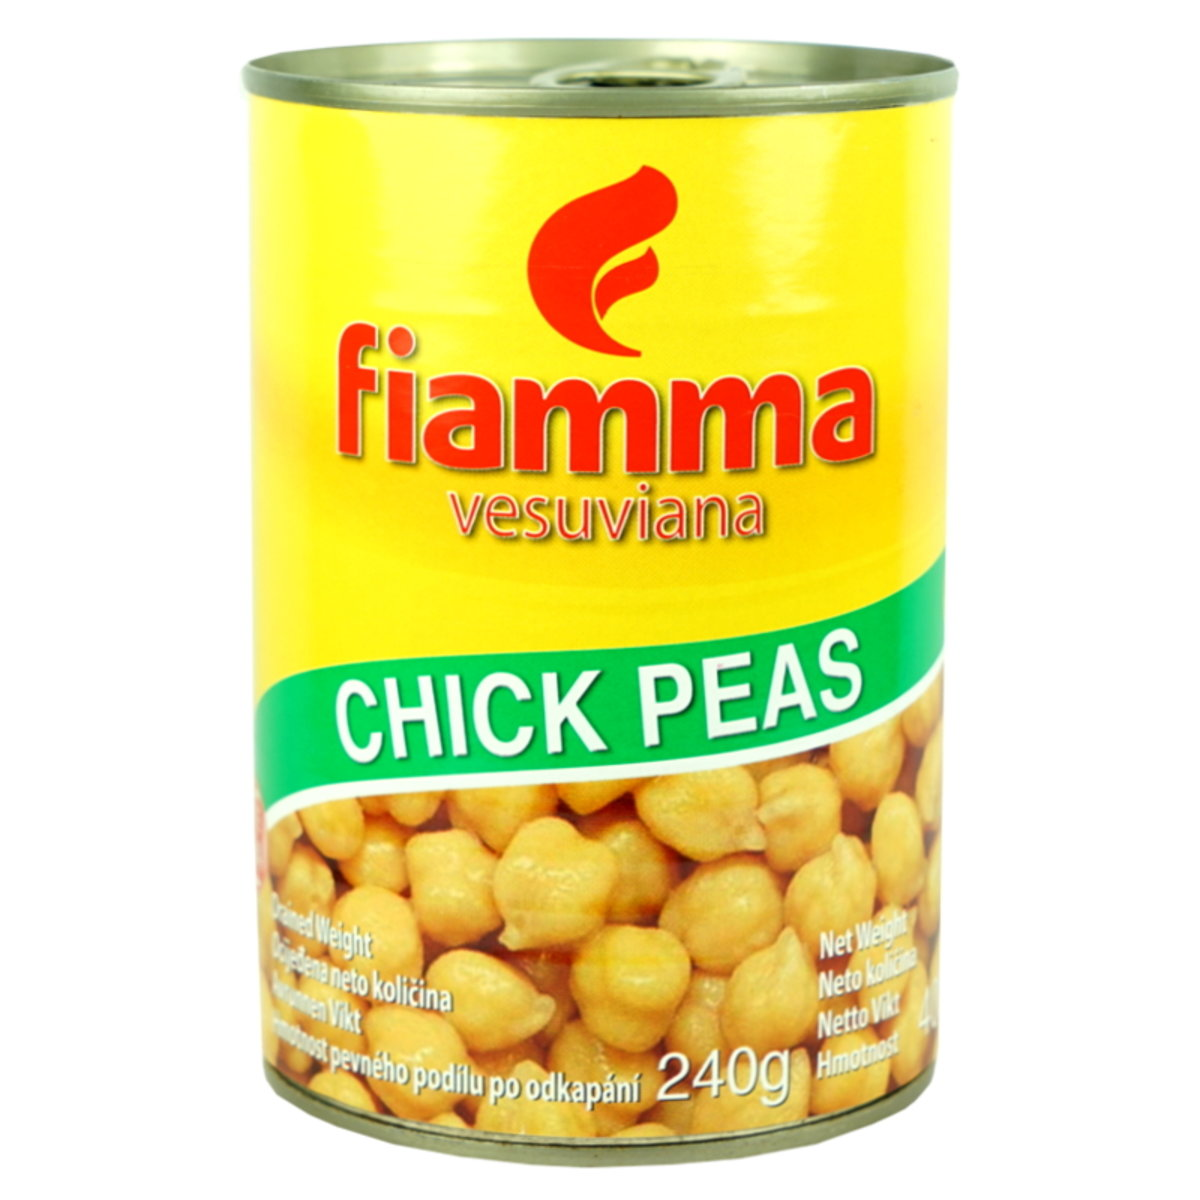 Italian Chick Peas 400g